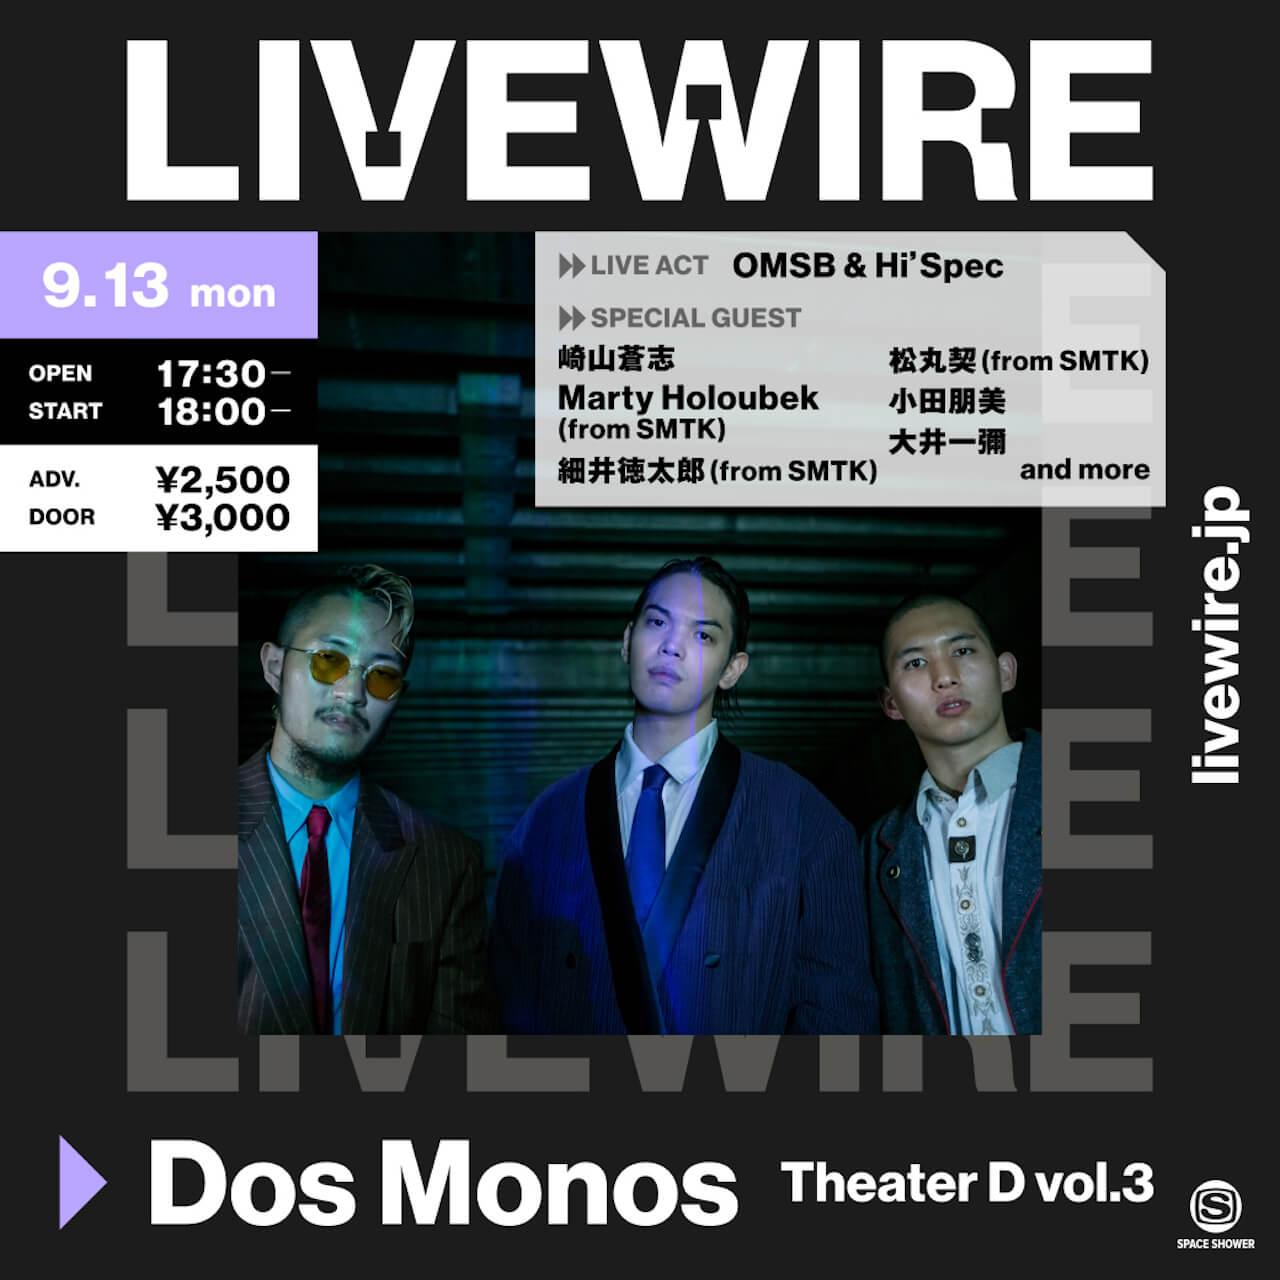 Dos Monosの自主企画<Theater D>がLIVEWIREにて生配信 ライブにOMSB&Hi'Spec、崎山蒼志ら豪華ゲストミュージシャンも music210907-dos-monos-live-wire